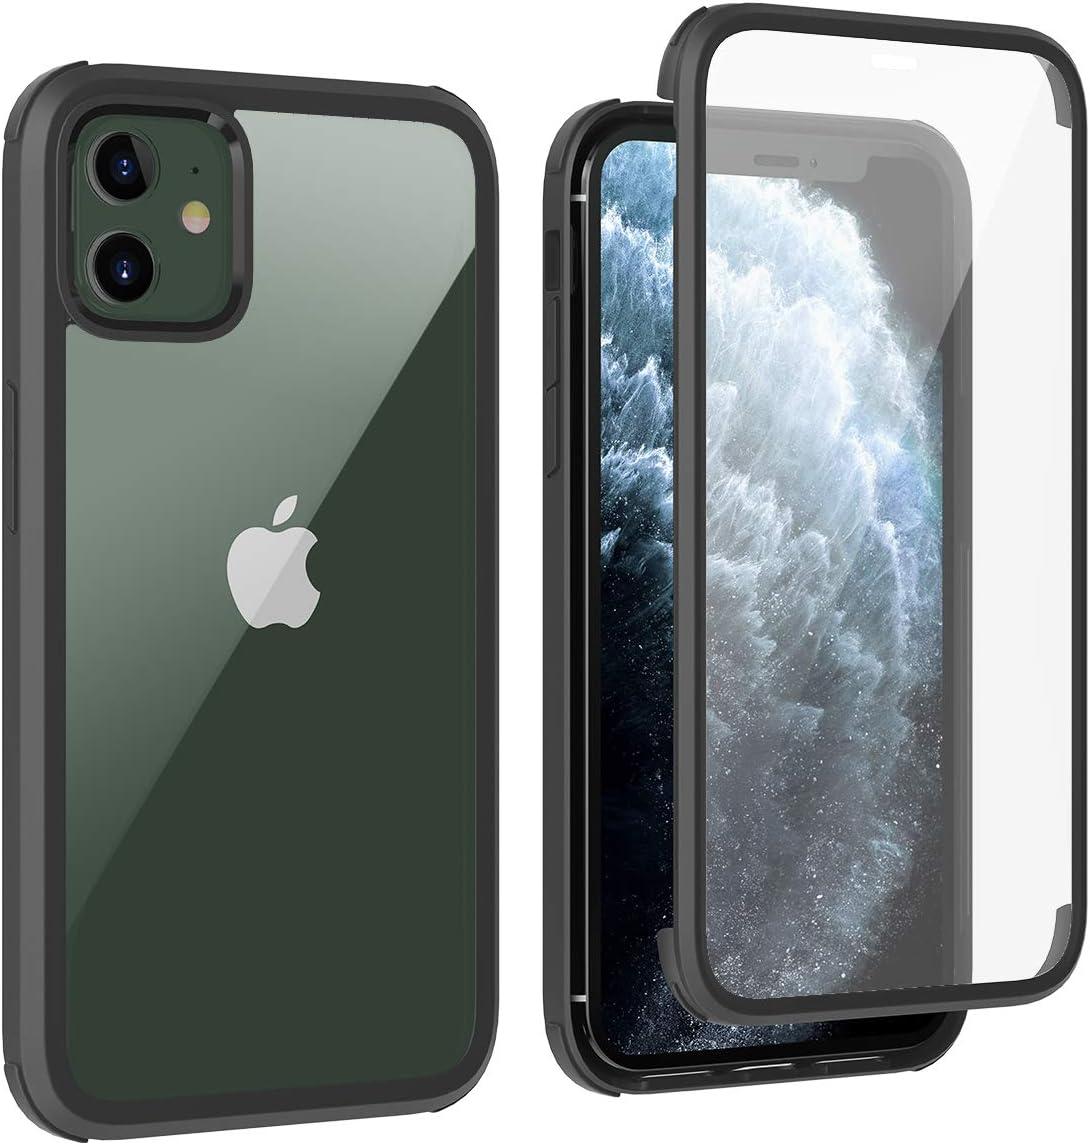 Lofter Iphone 11 Case 360 Degree Full Body Protective Elektronik